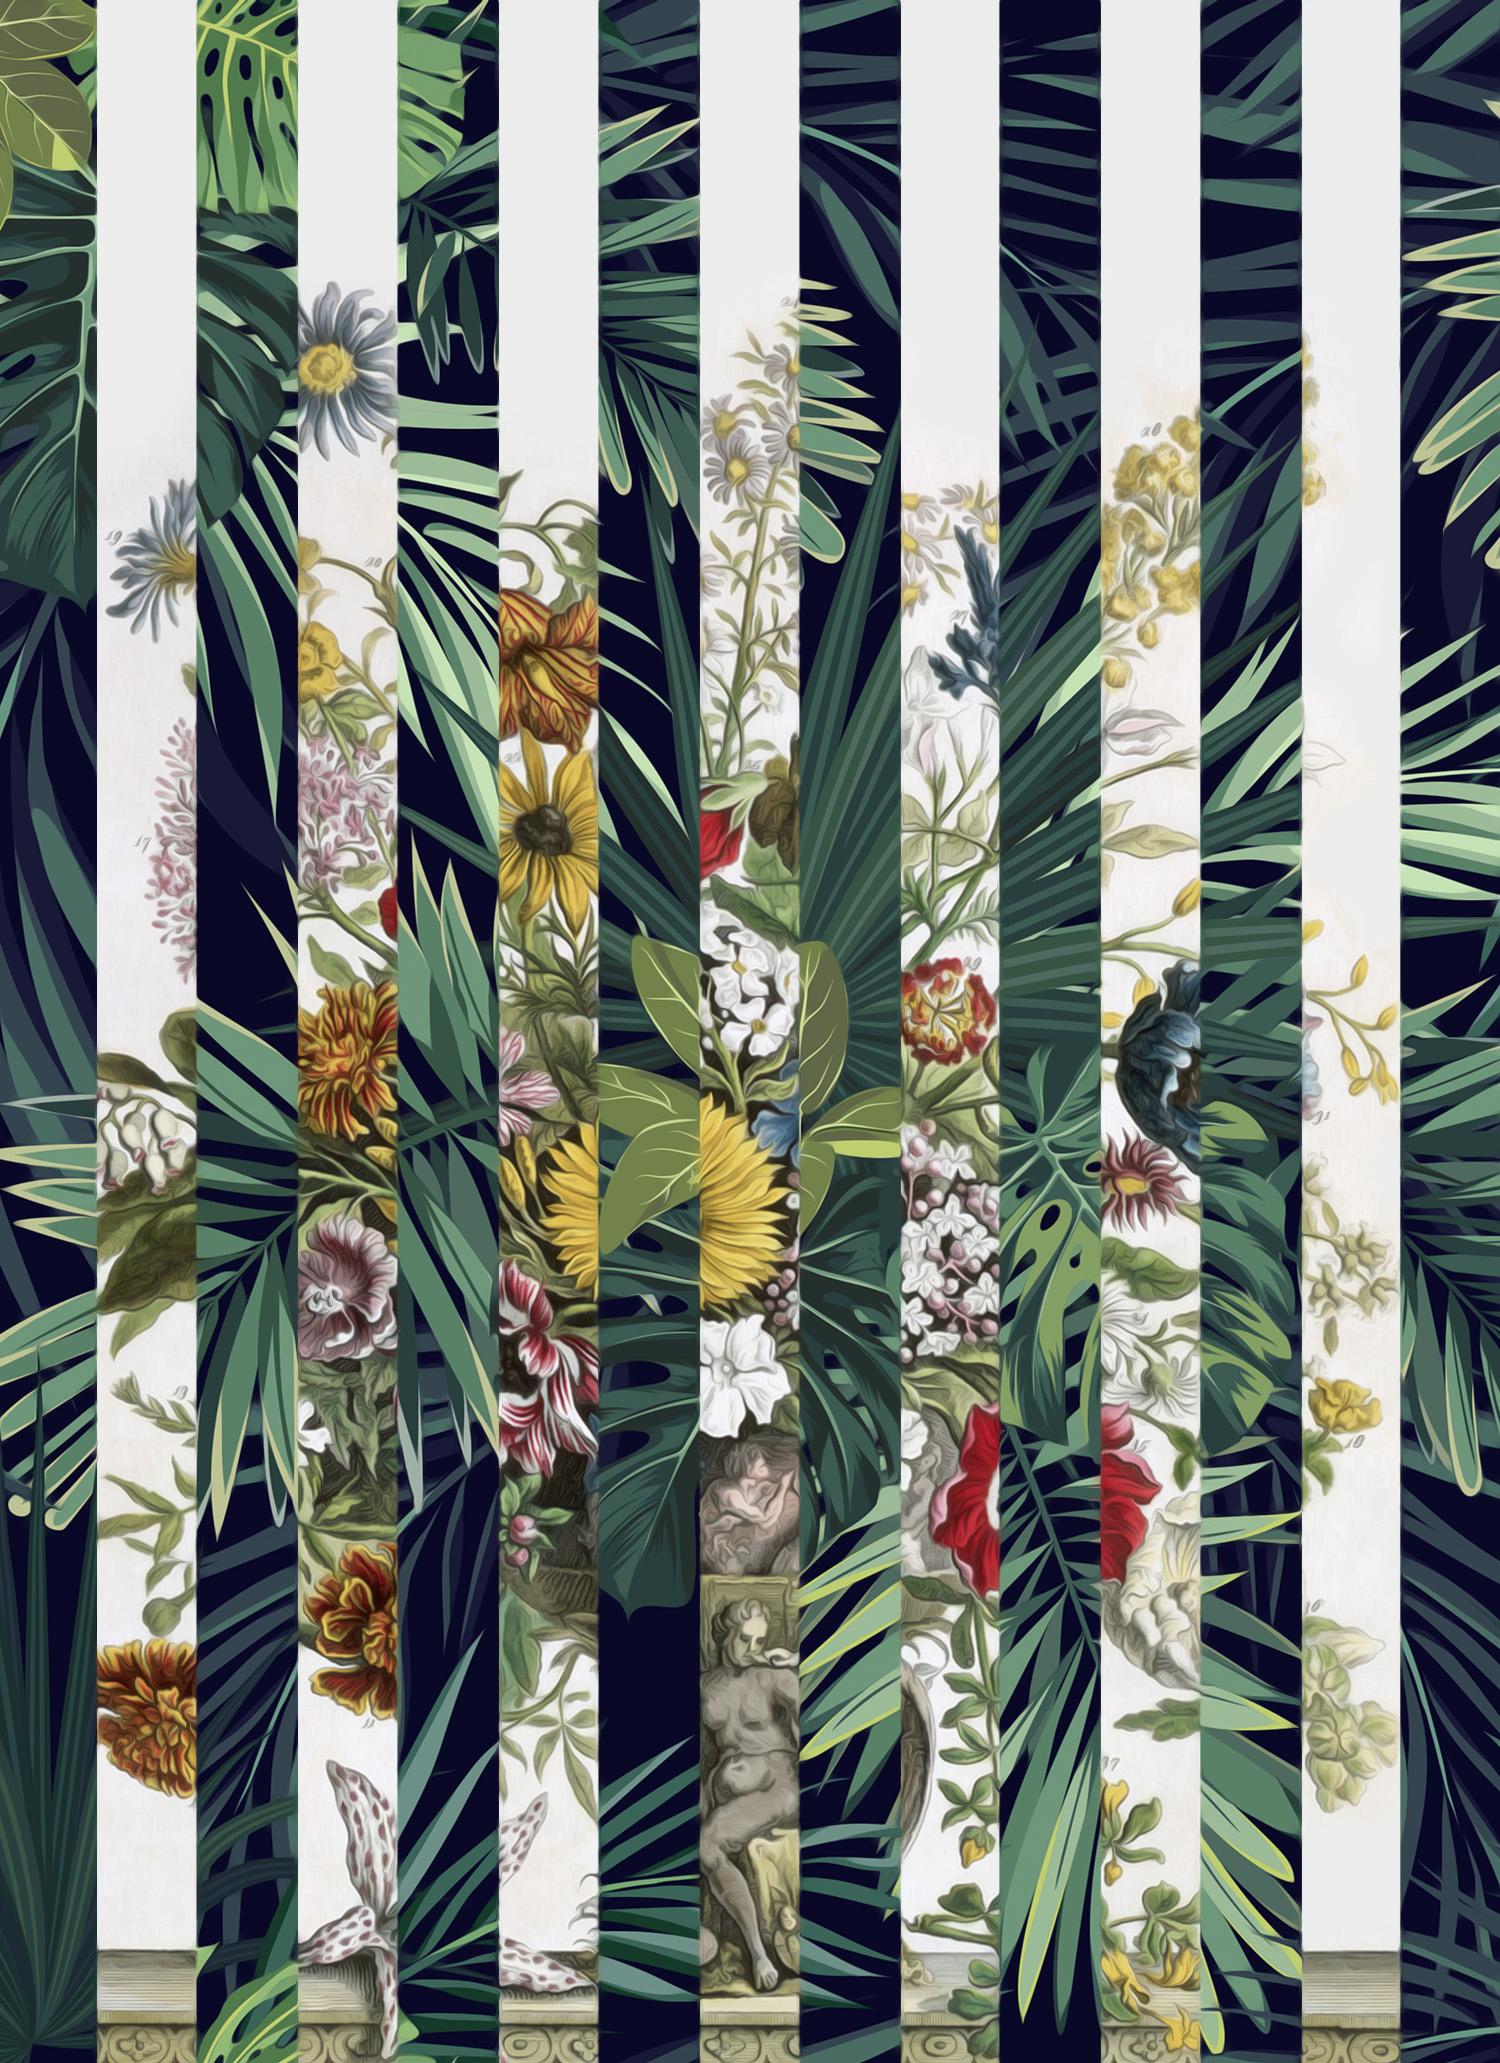 Plants Untitled 2 by Dan Alva